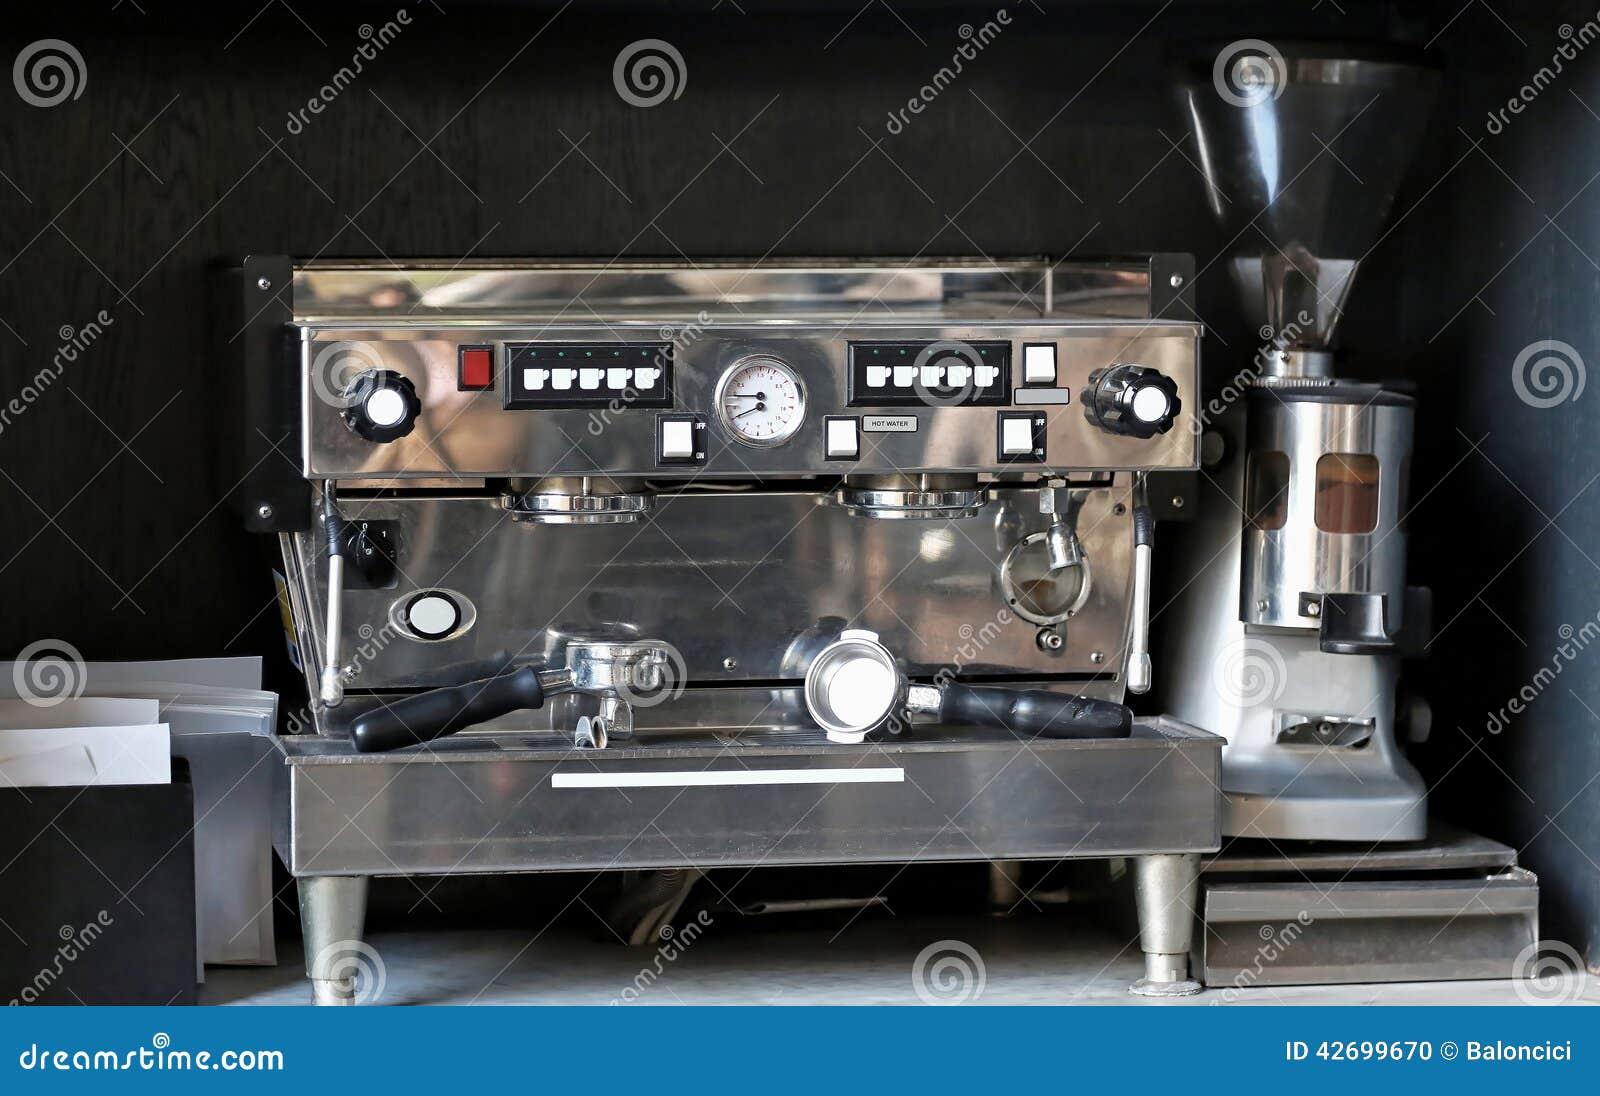 espresso coffee machine stock photo image 42699670. Black Bedroom Furniture Sets. Home Design Ideas